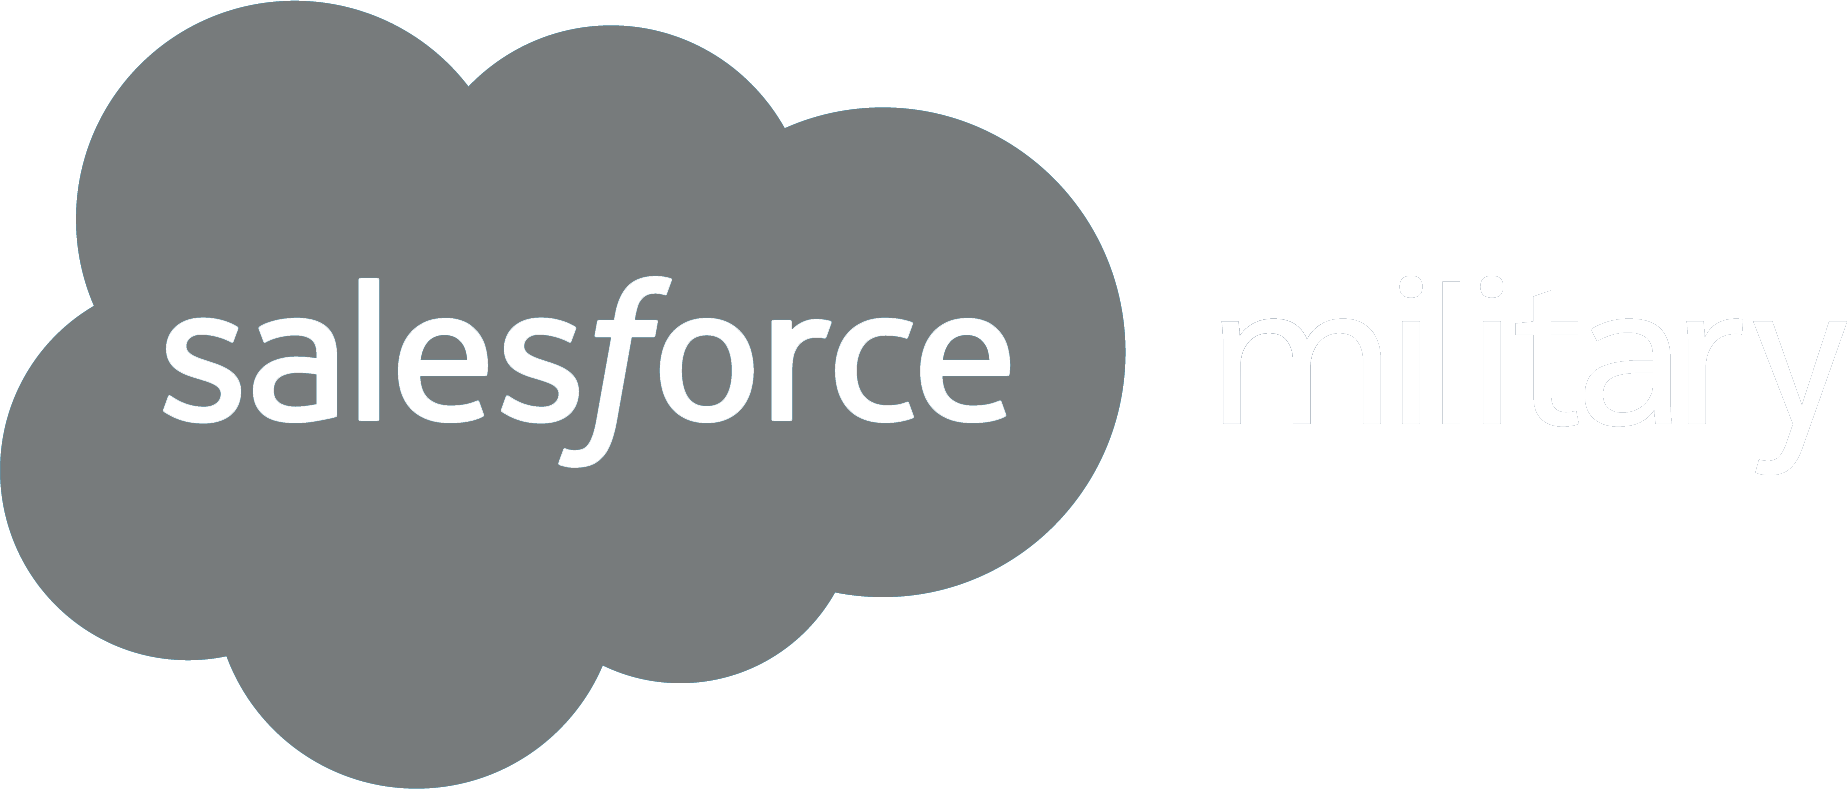 salesforce military logo 2